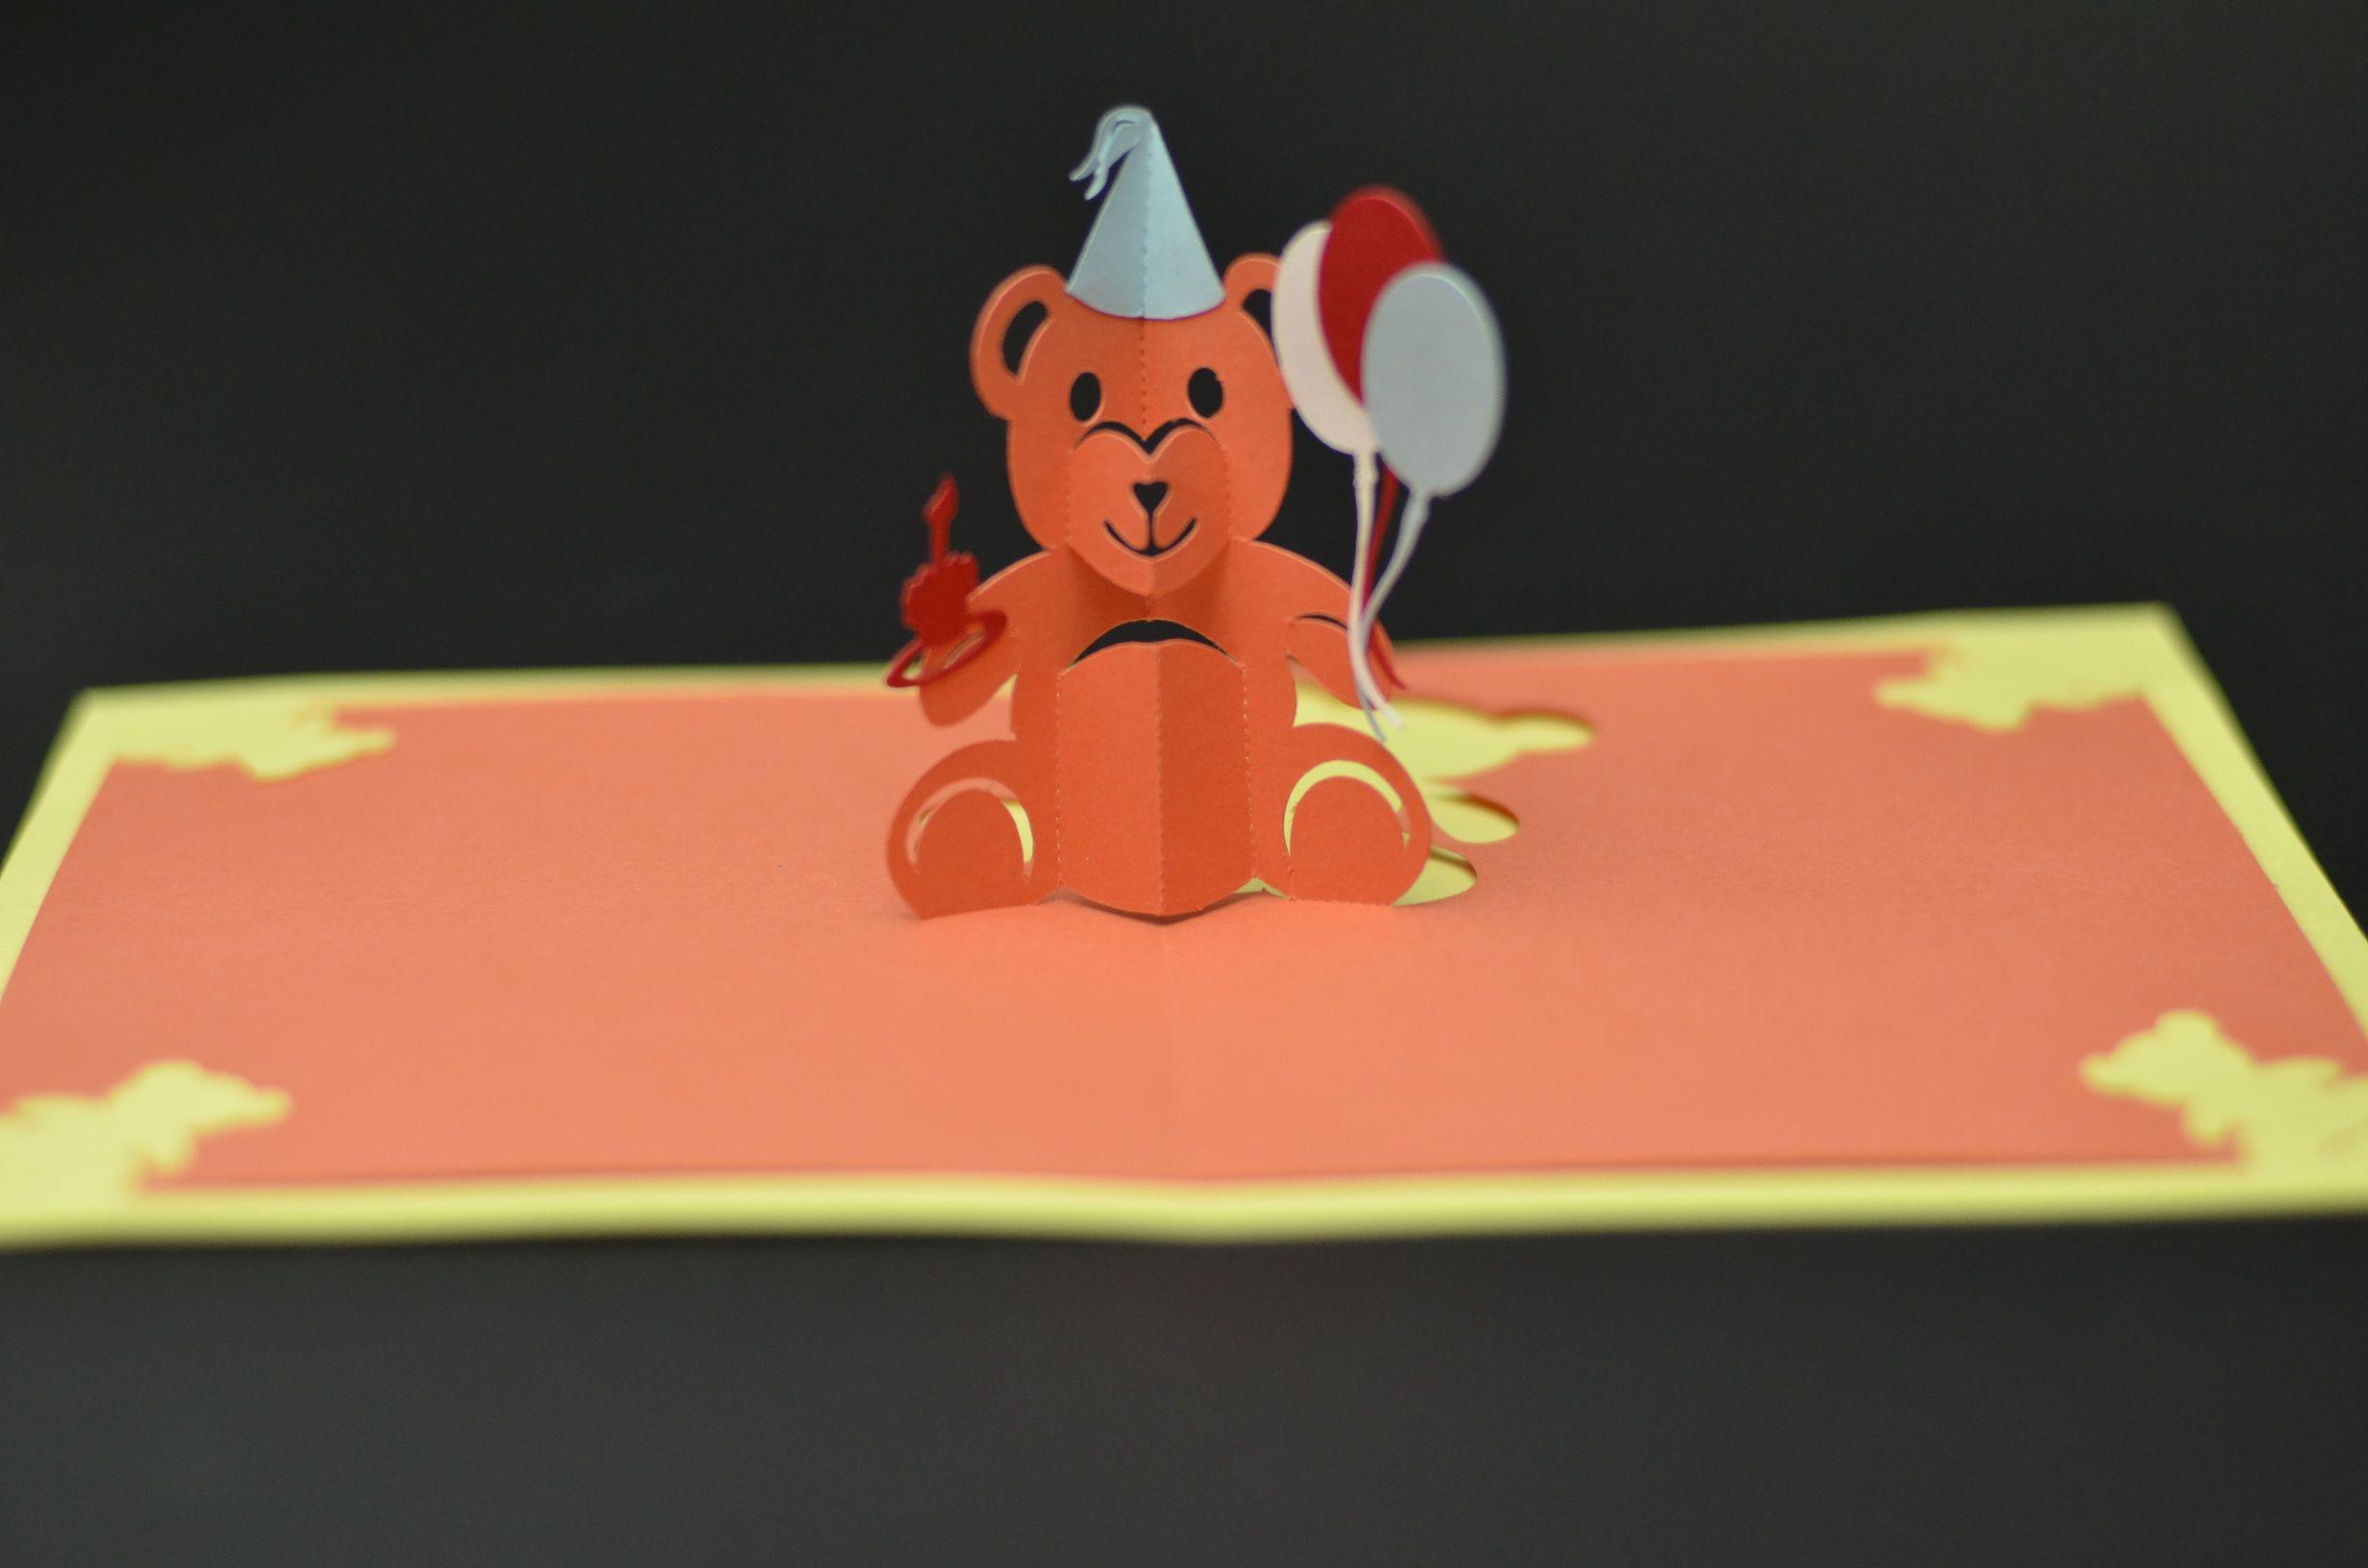 Teddy Bear Pop Up Card Tutorial And Template Creative Pop Up Cards Pop Up Card Templates Bear Card Pop Up Cards